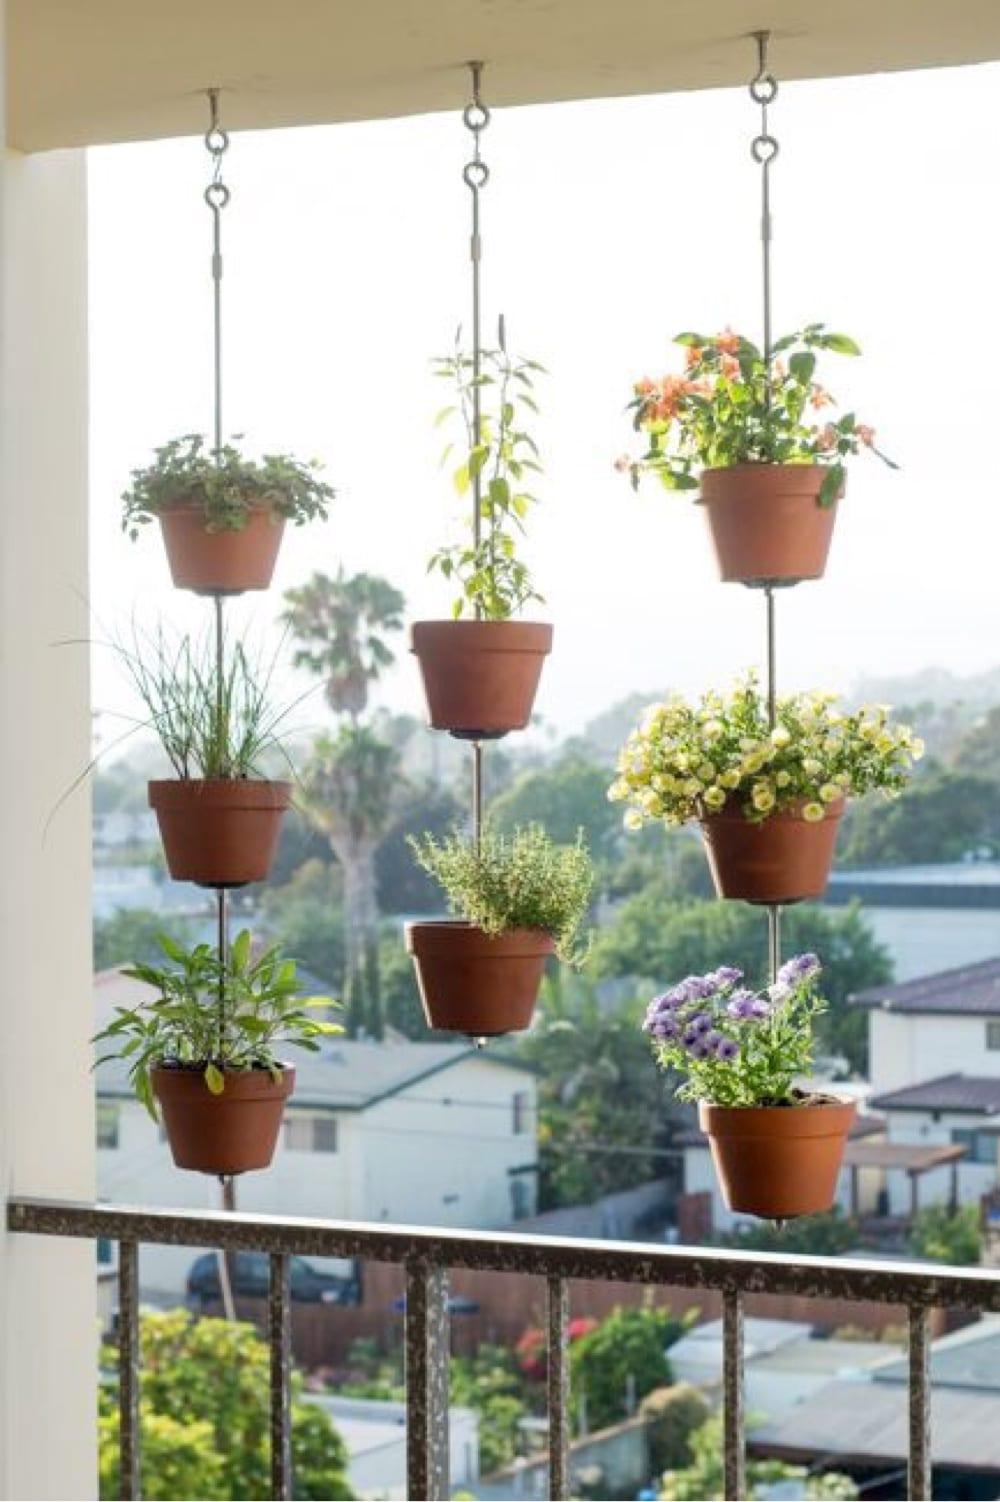 Hanging Balcony Garden Ideas